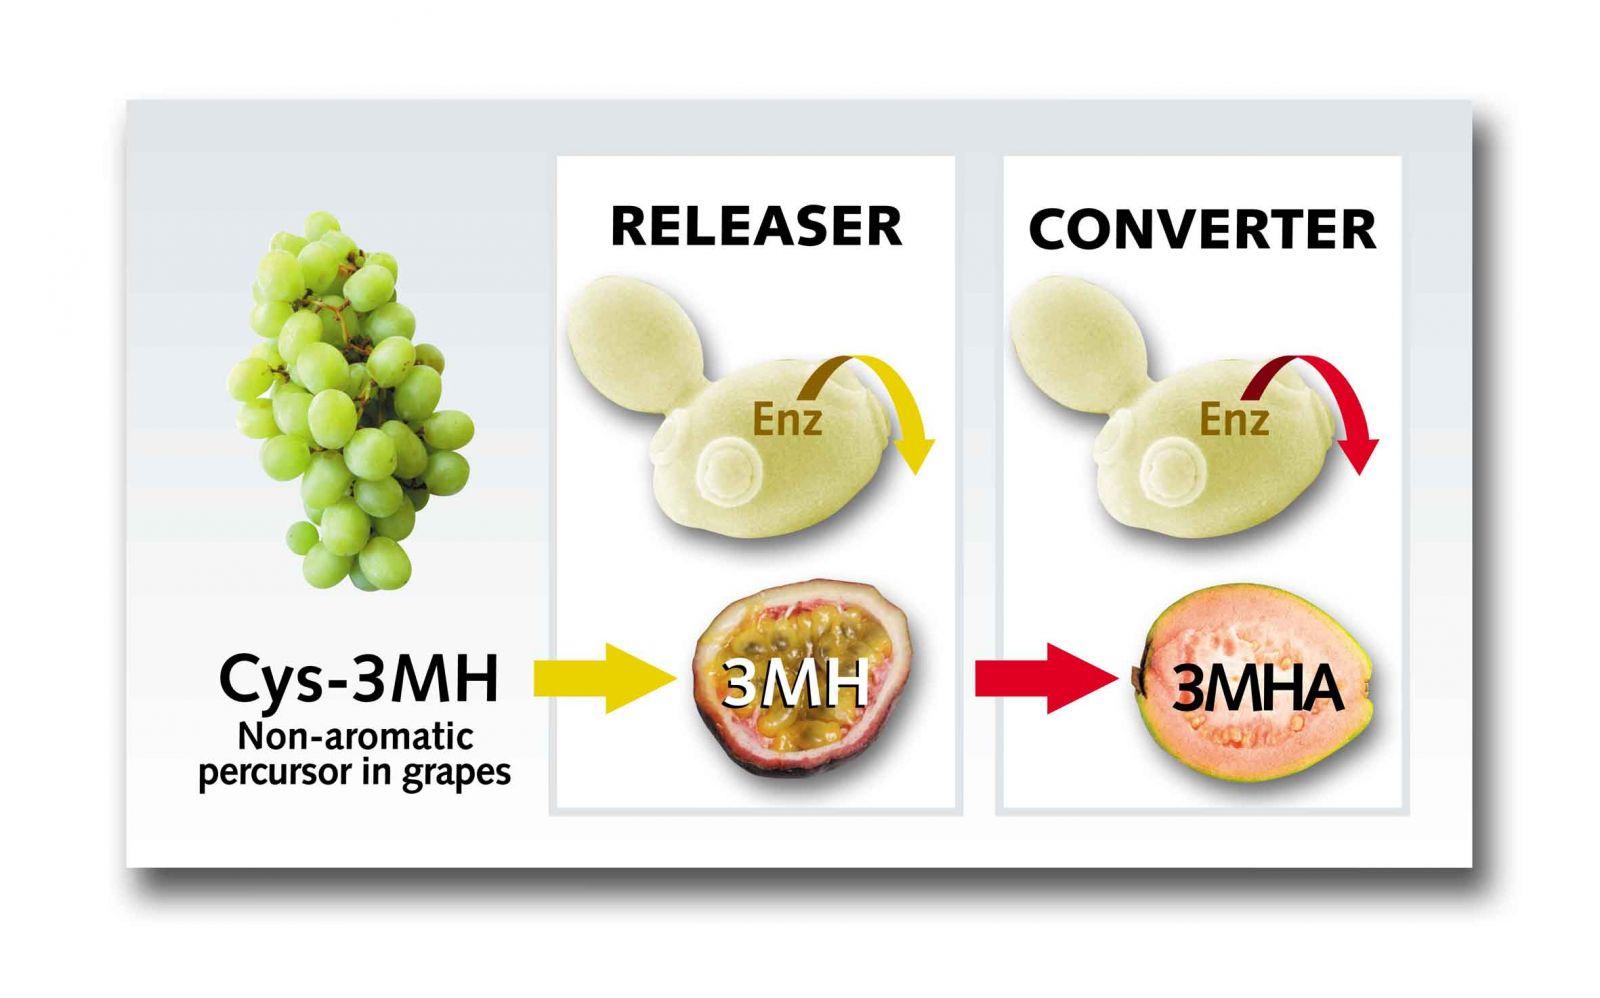 Releaser Converter